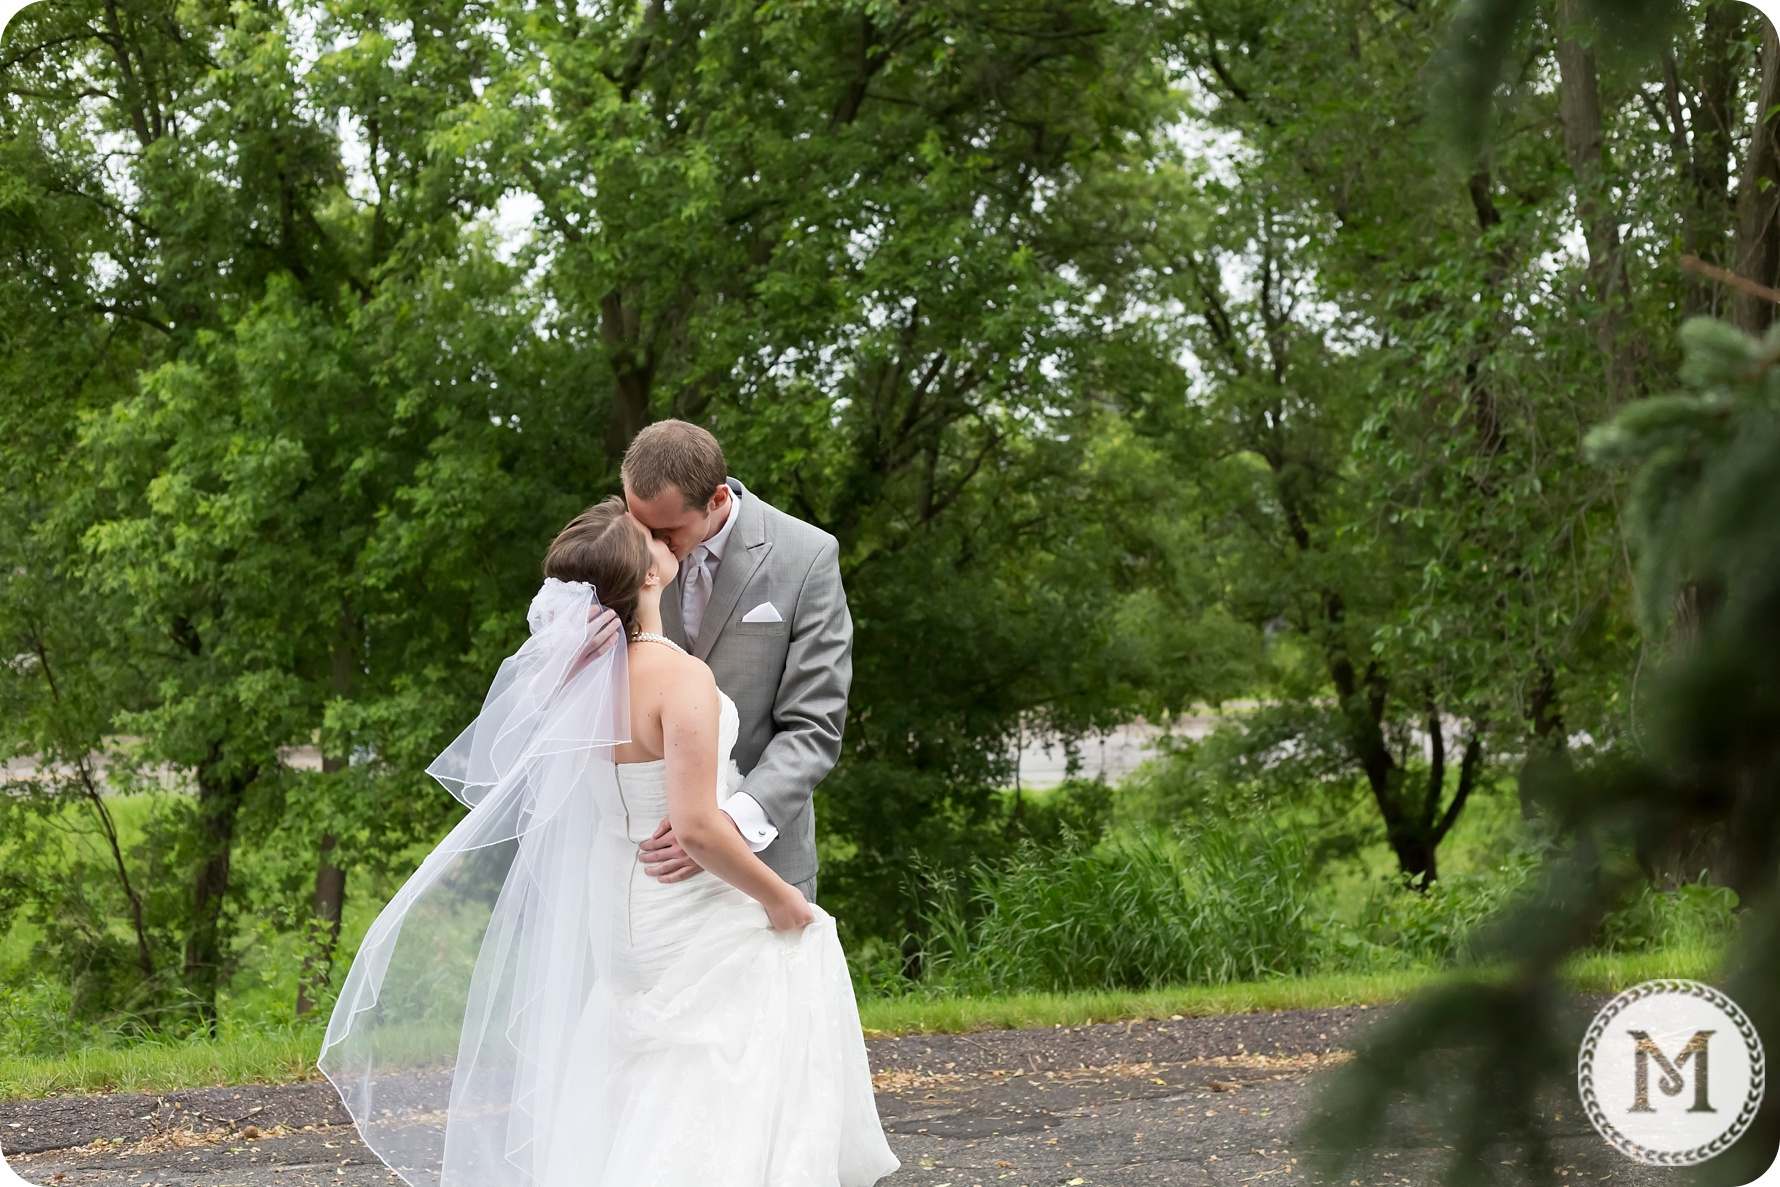 mckenziesmithphotography.com_0208